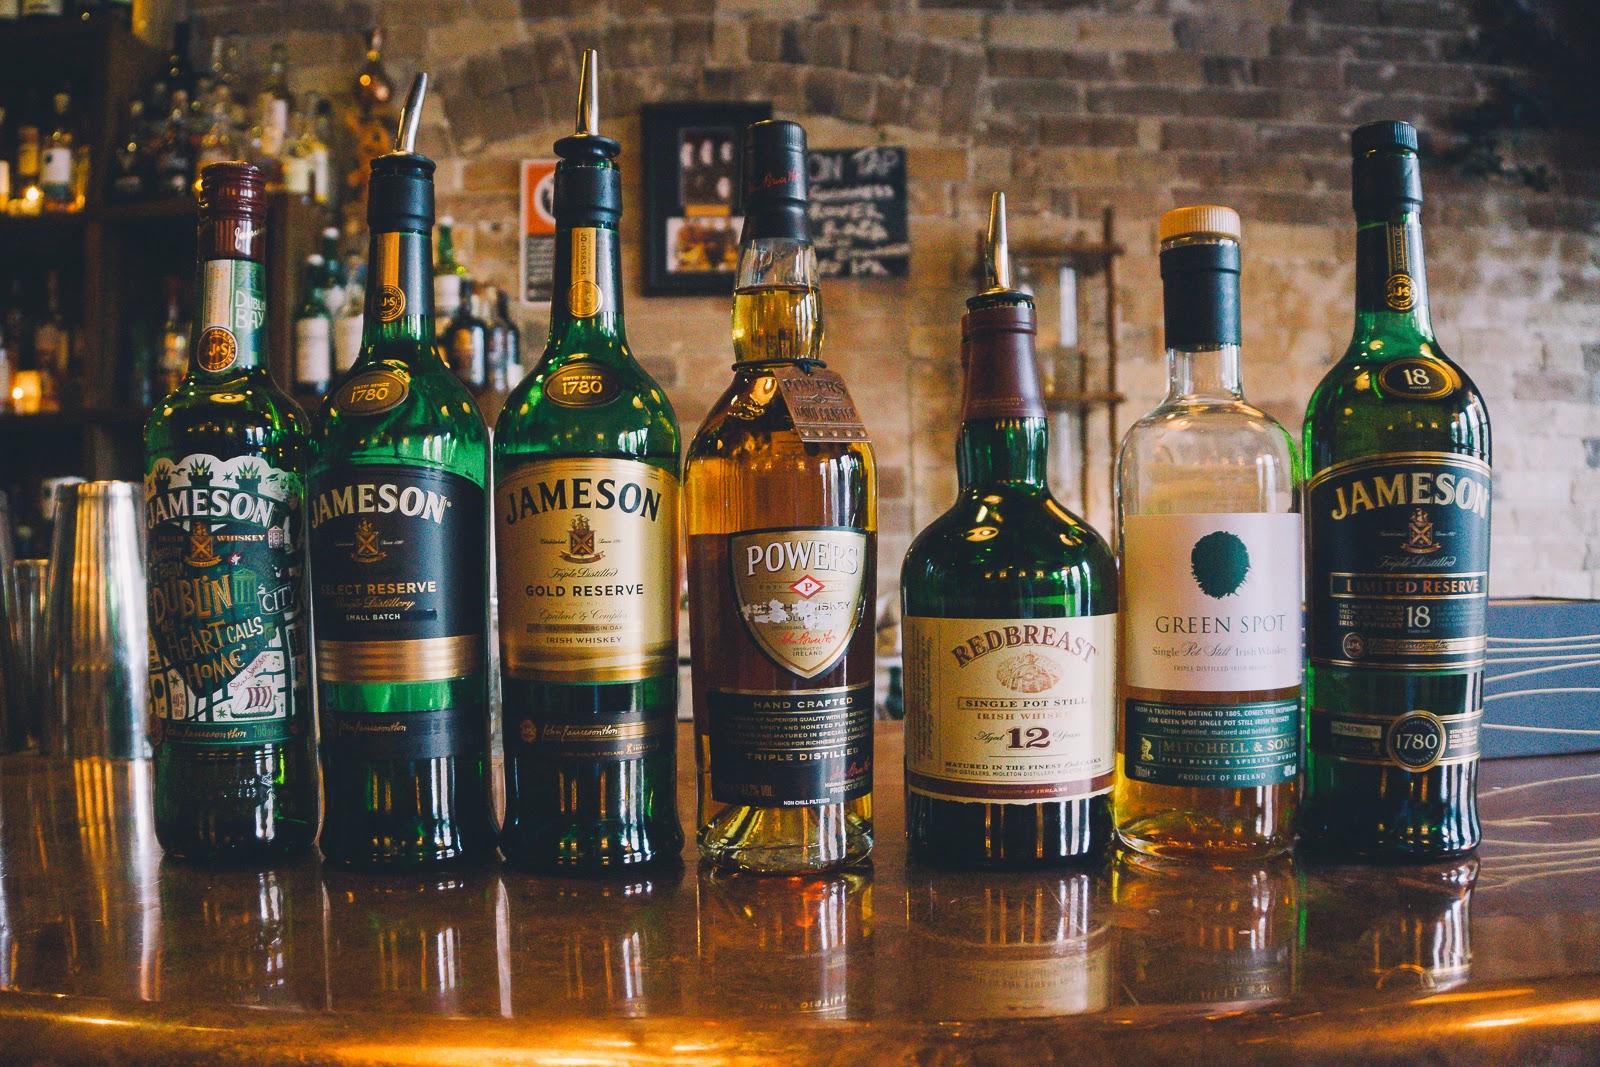 Ирландский виски Jameson Gold цена в Duty Free?